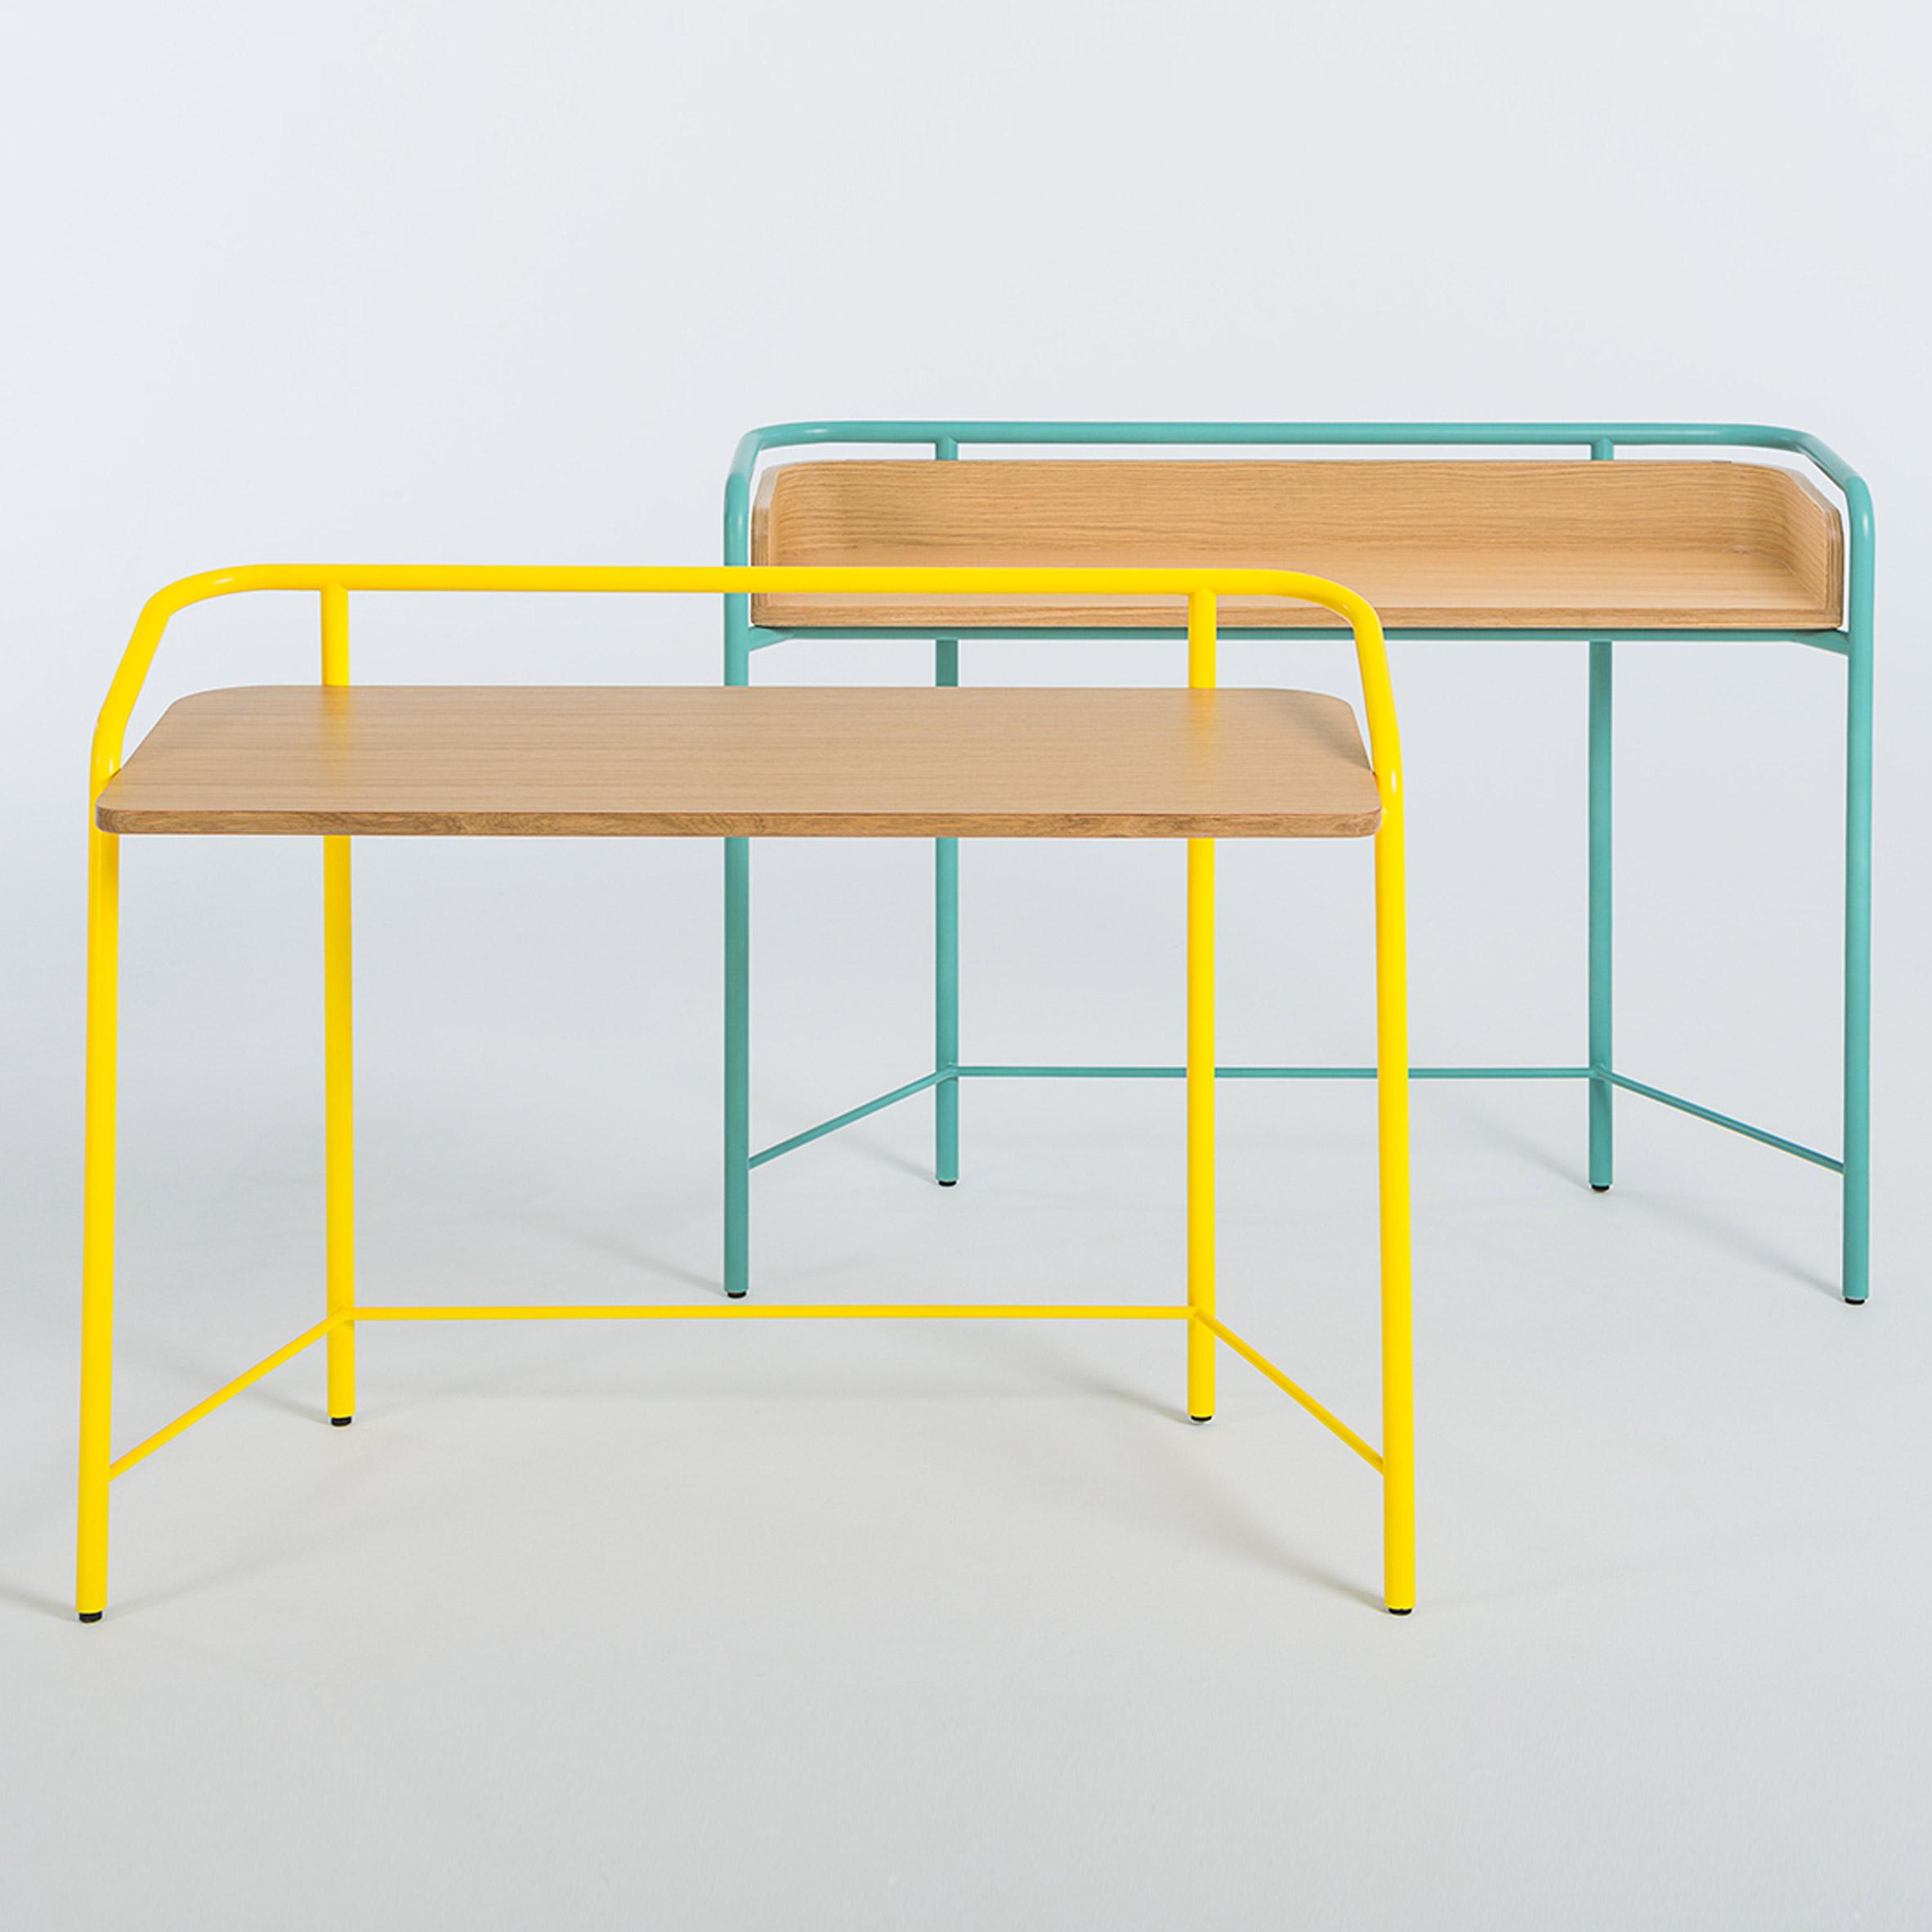 play-play-collection-2-journey-east-lanzavecchia-wai-furniture-design_dezeen_2364_col_11